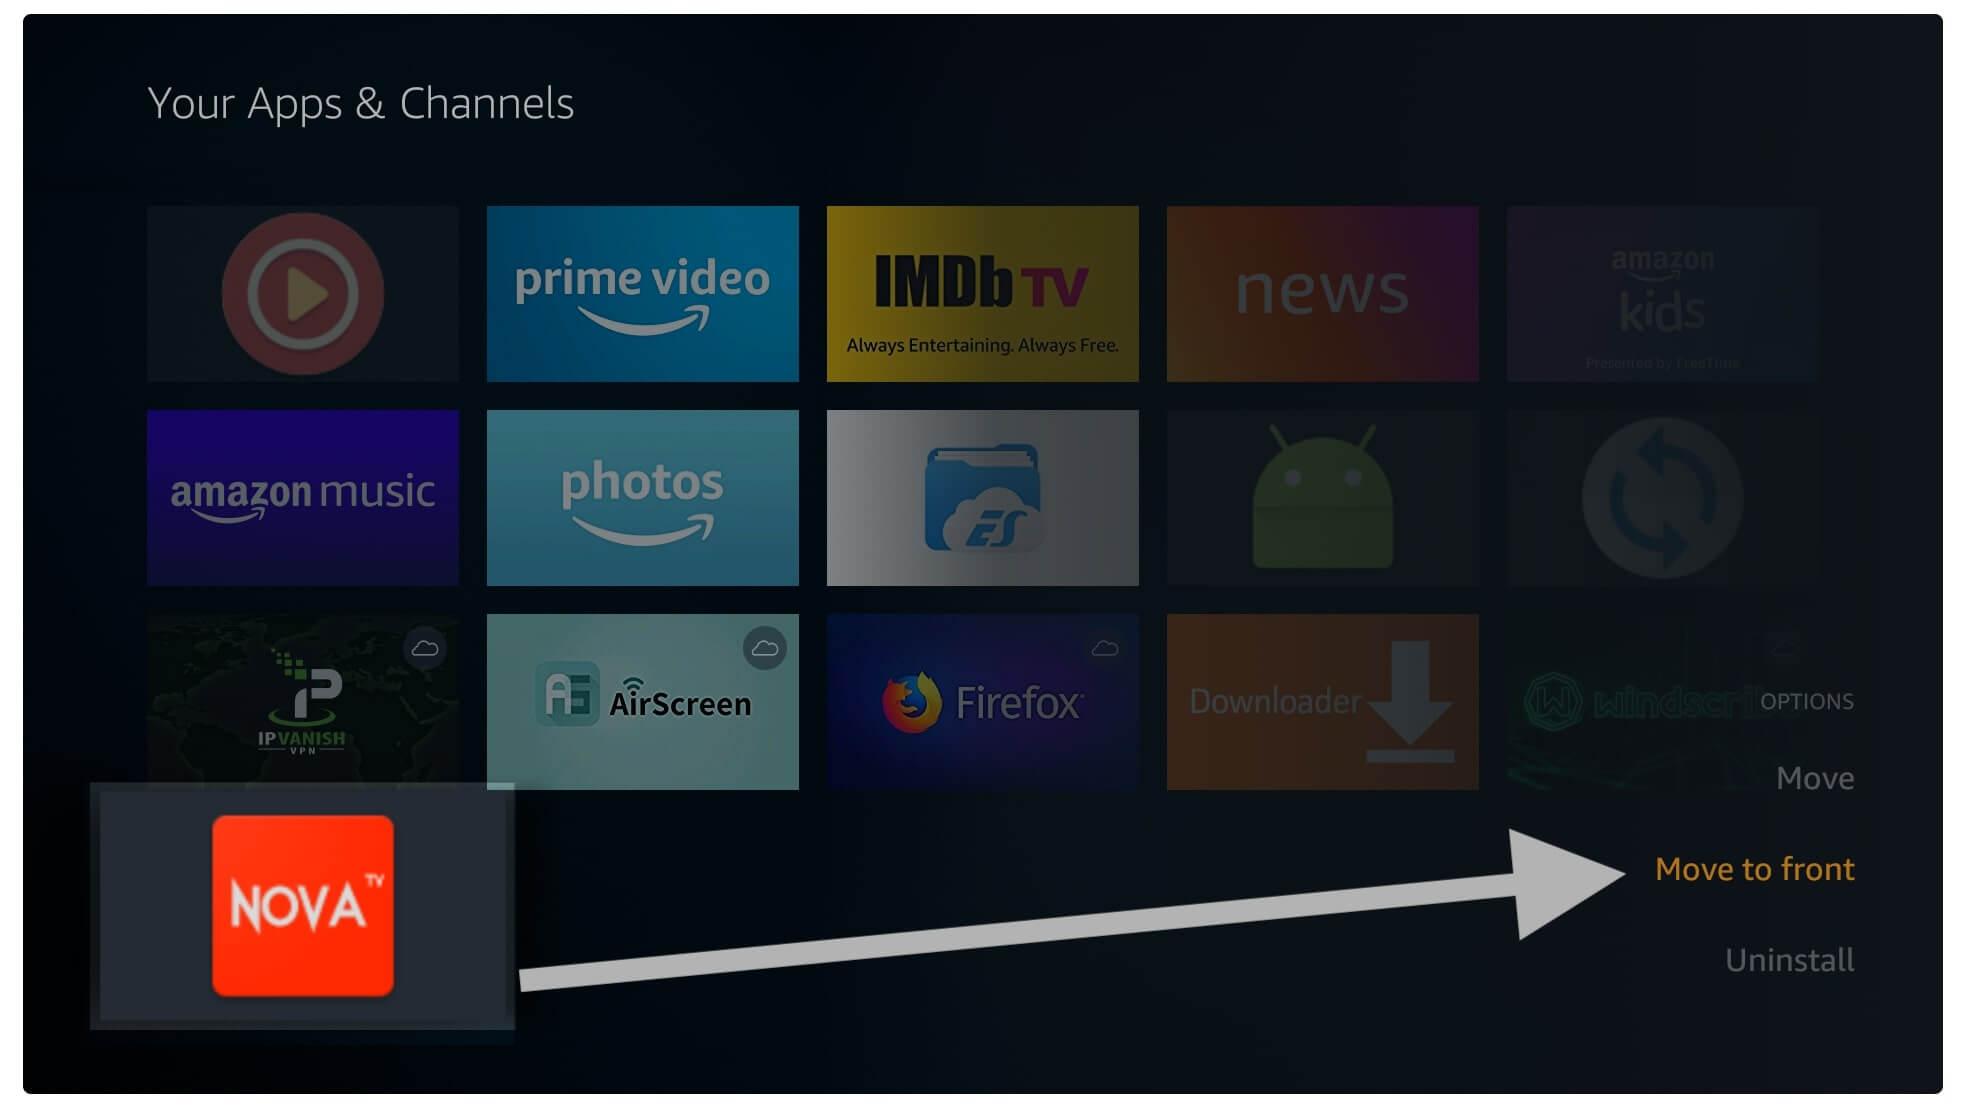 How-to-Use-Nova-TV-App-on-Firestick